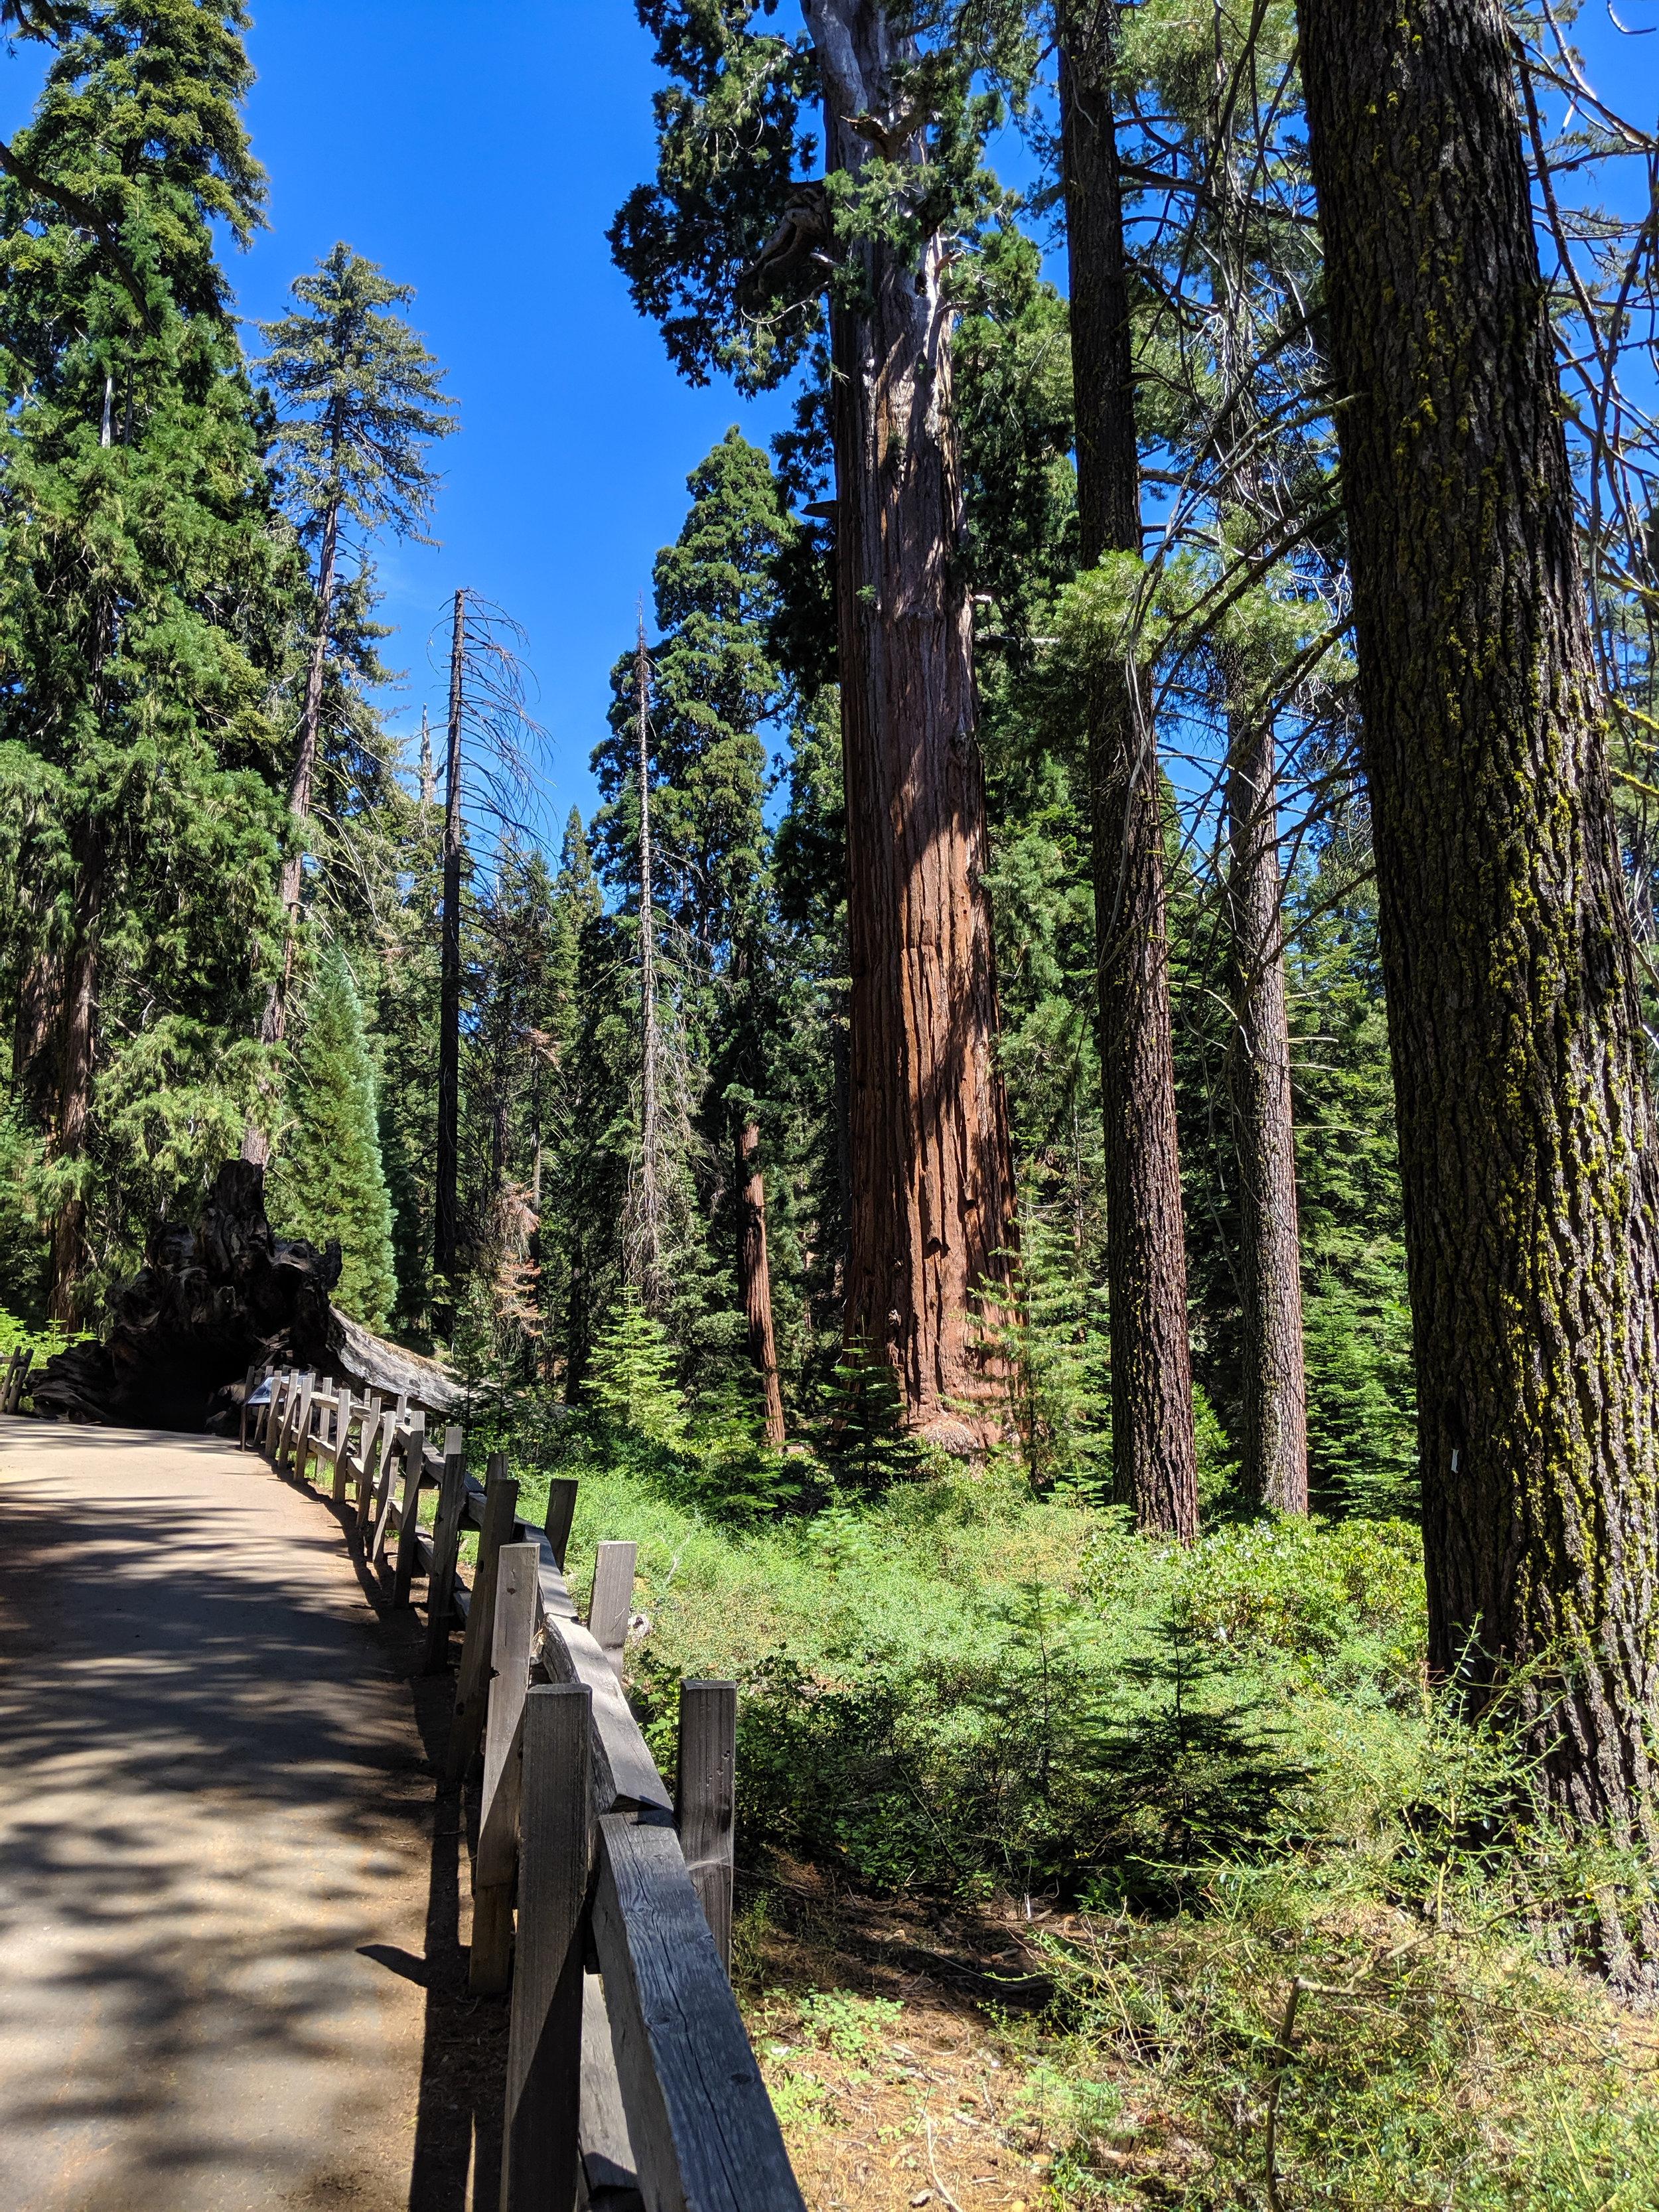 Kings Canyon, Grants Grove, Kings Canyon National Park, CA National Parks